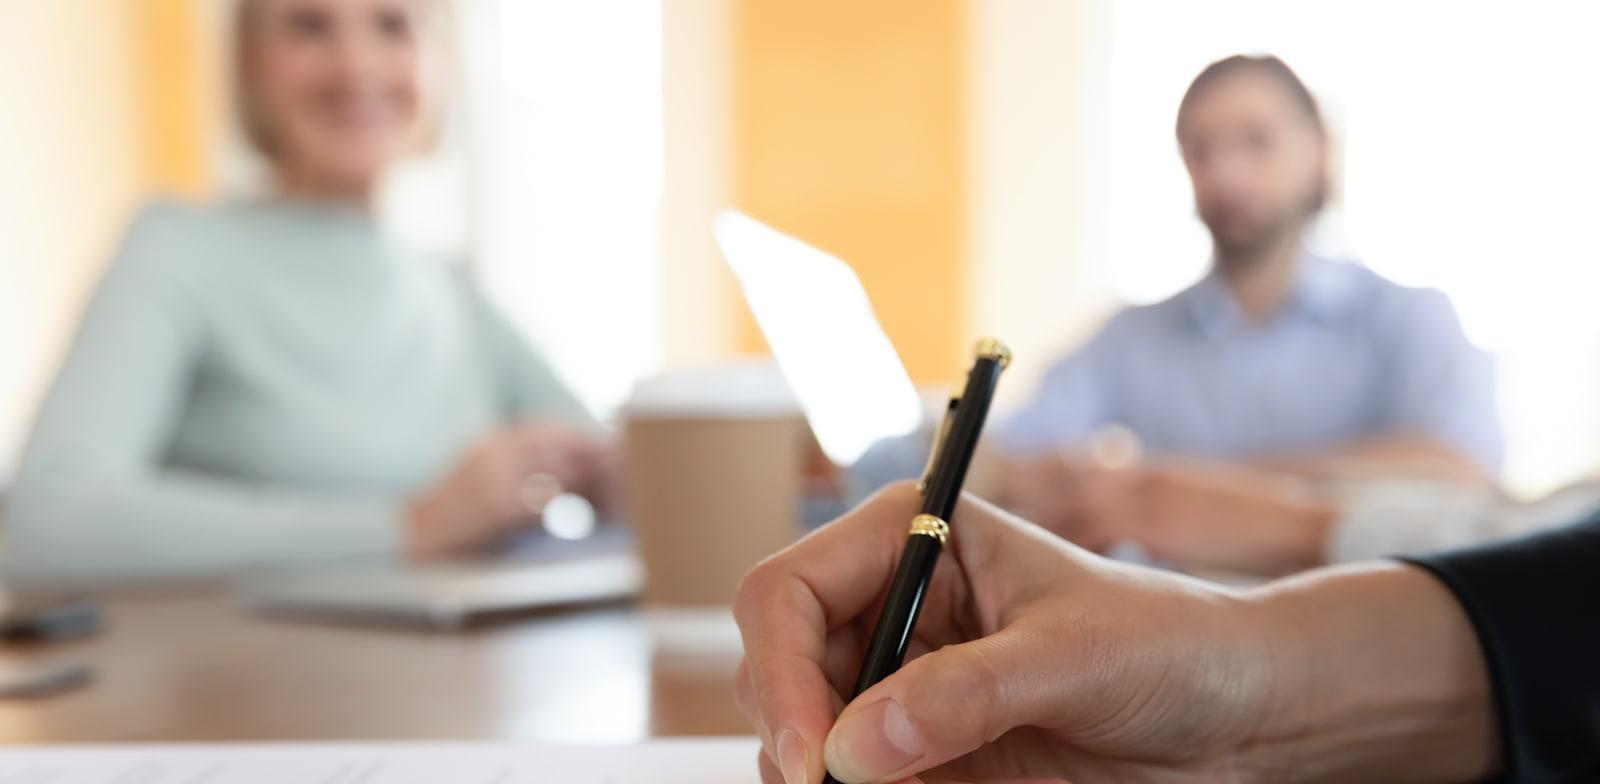 אישור פטנטים וחוזה קניין רוחני / אילוסטרציה: Shutterstock, fizkes